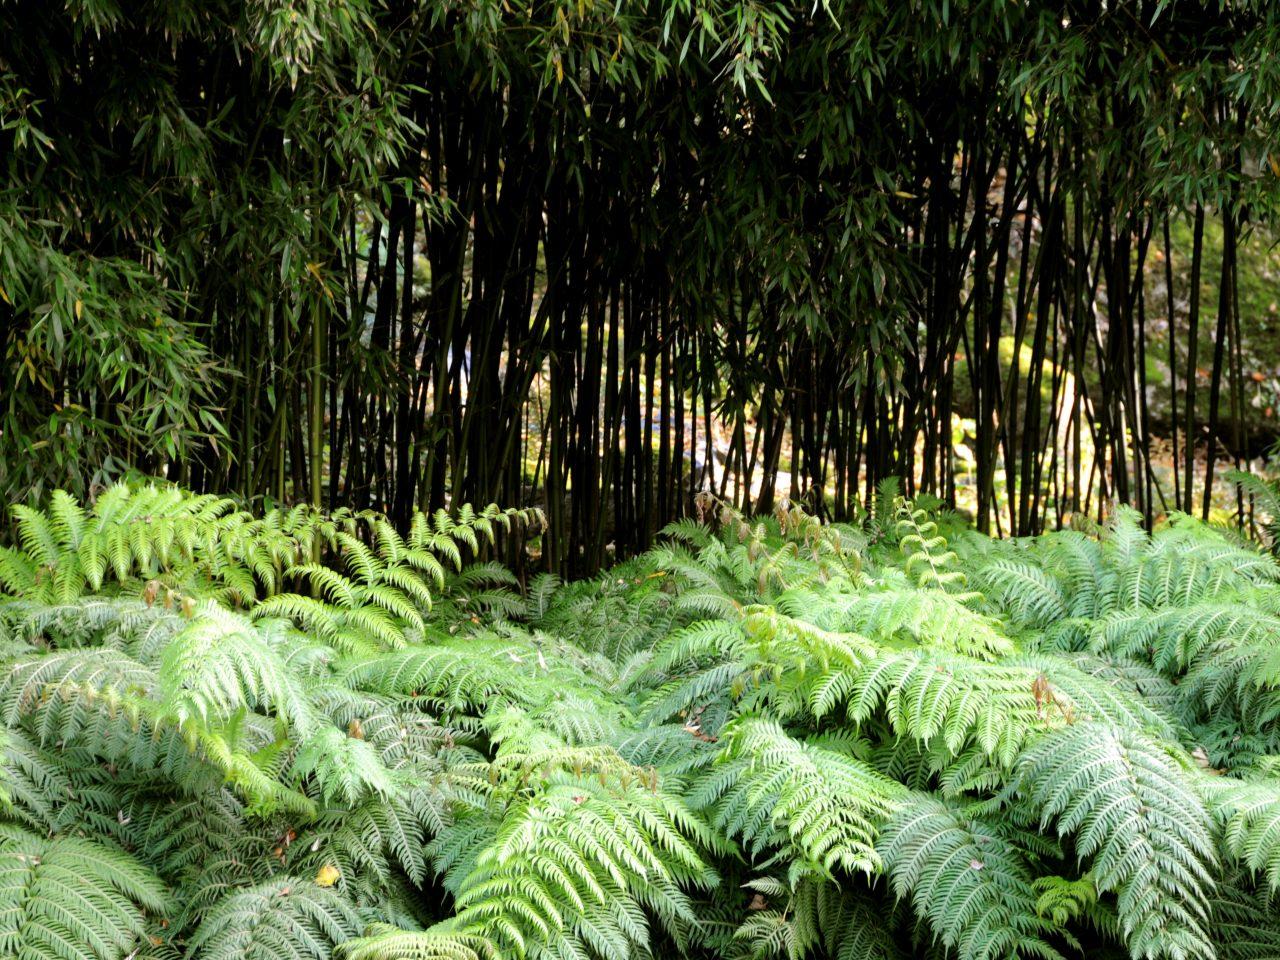 Bamboofern